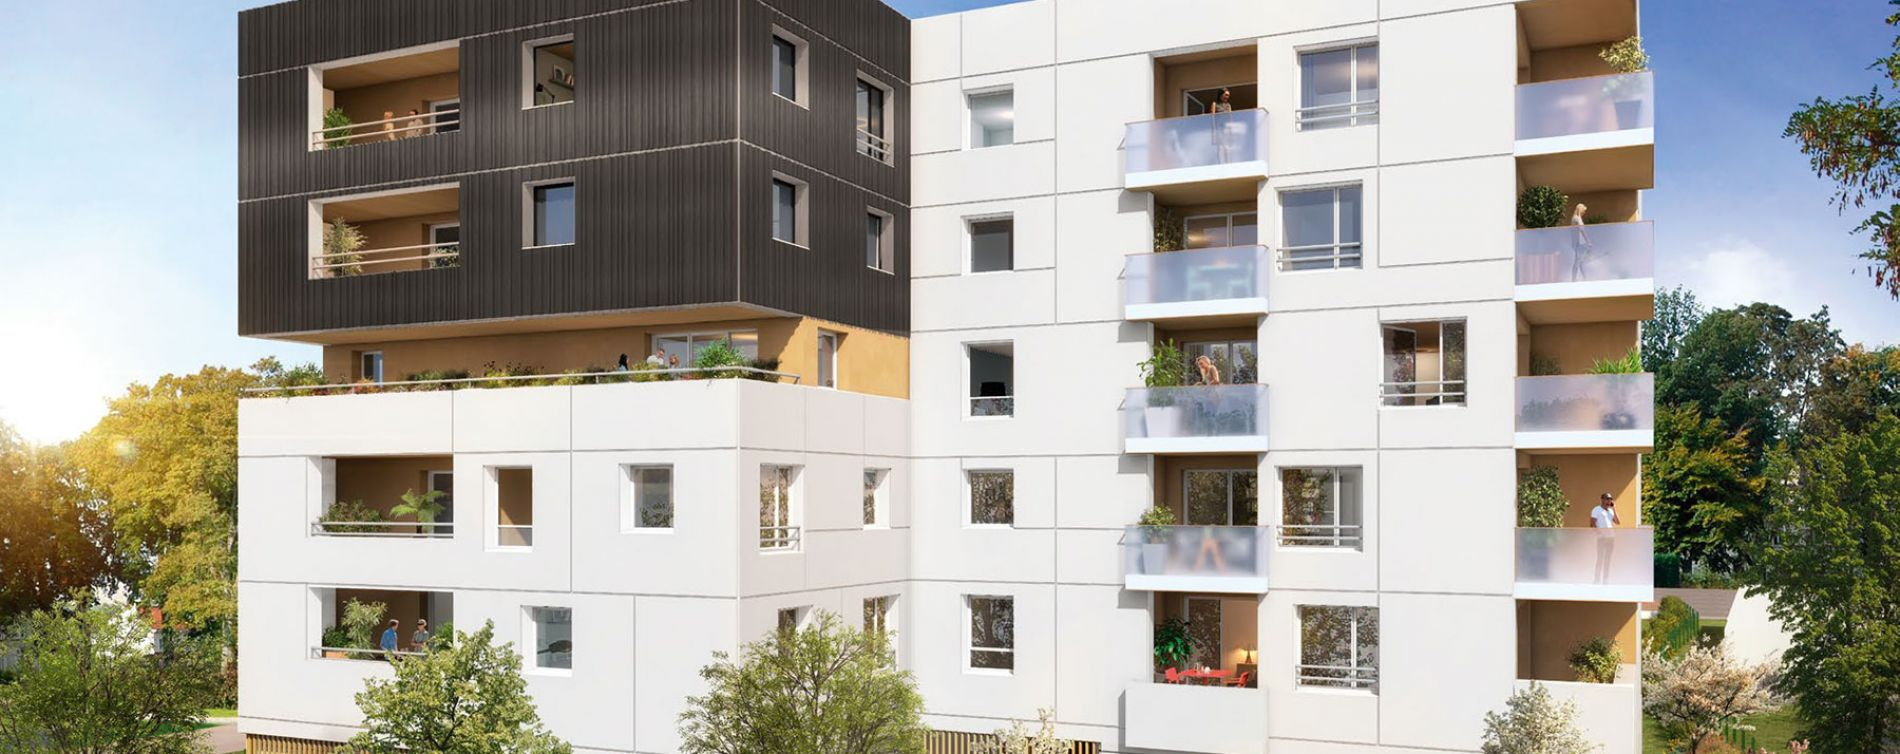 Nantes : programme immobilier neuve « Programme immobilier n°217825 » (2)